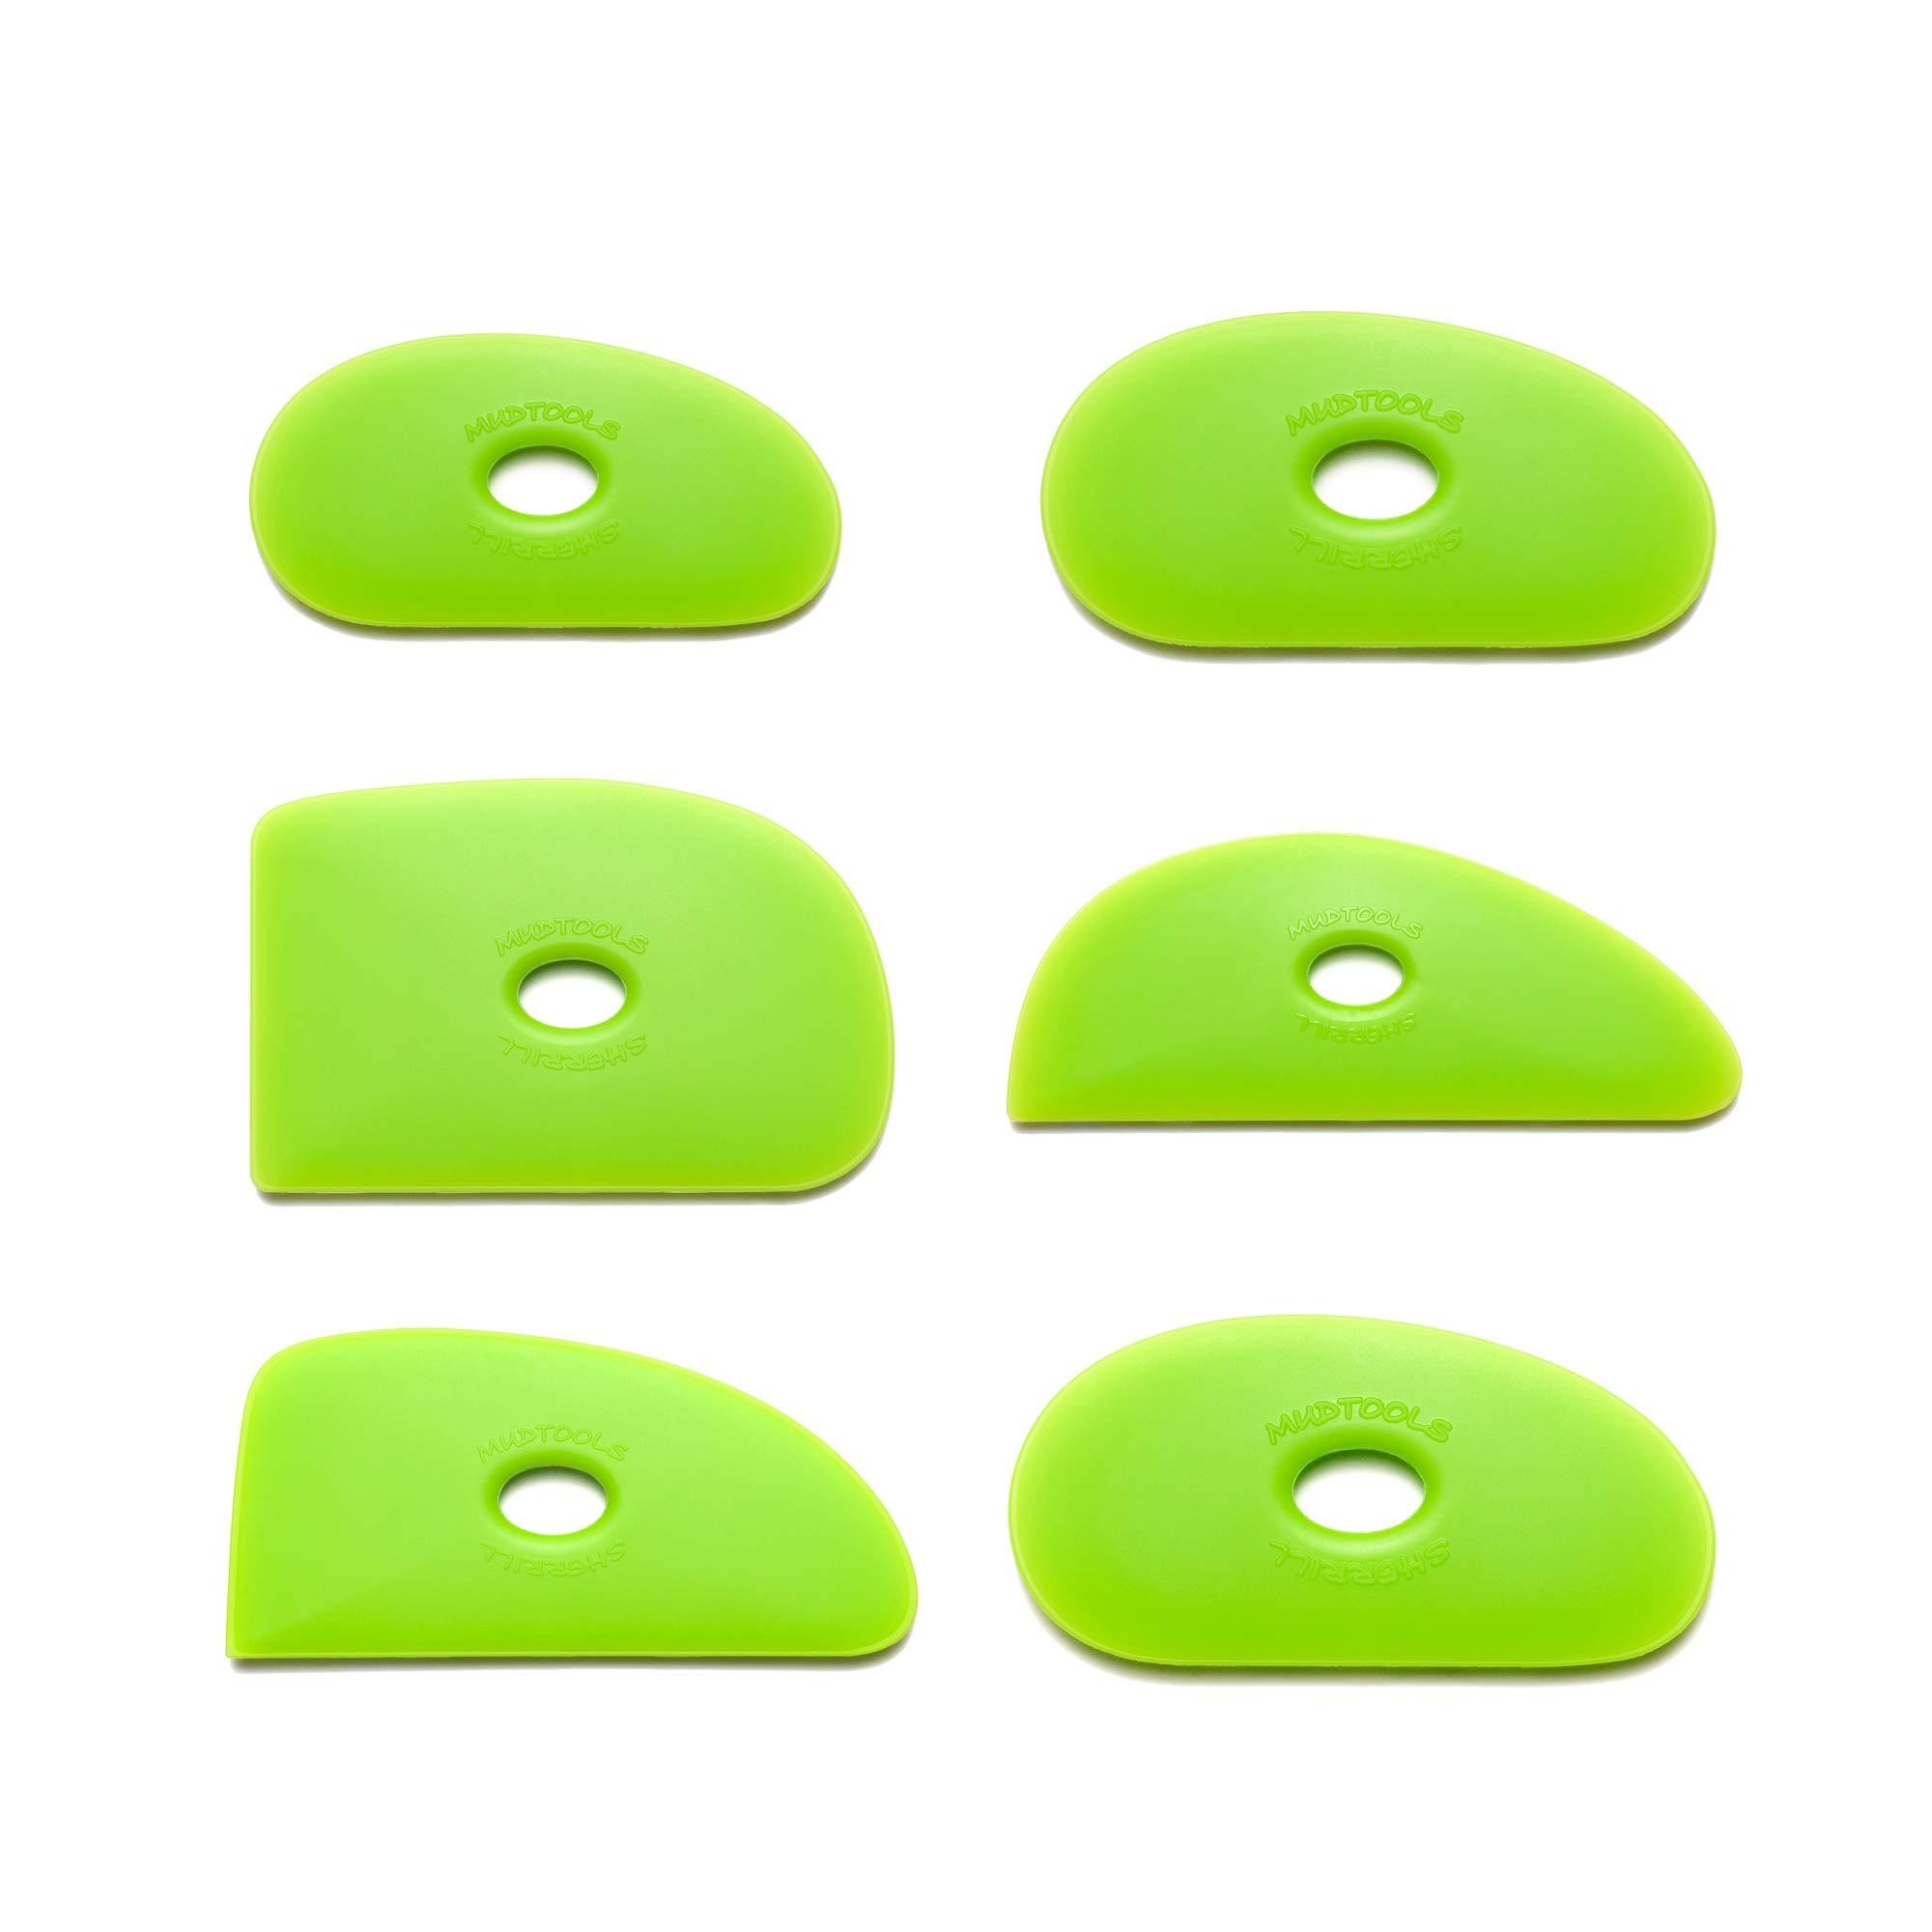 Mudtools Polymer Rib Green Medium - All 6 Shapes - Ceramics, Pottery, Clay - GA